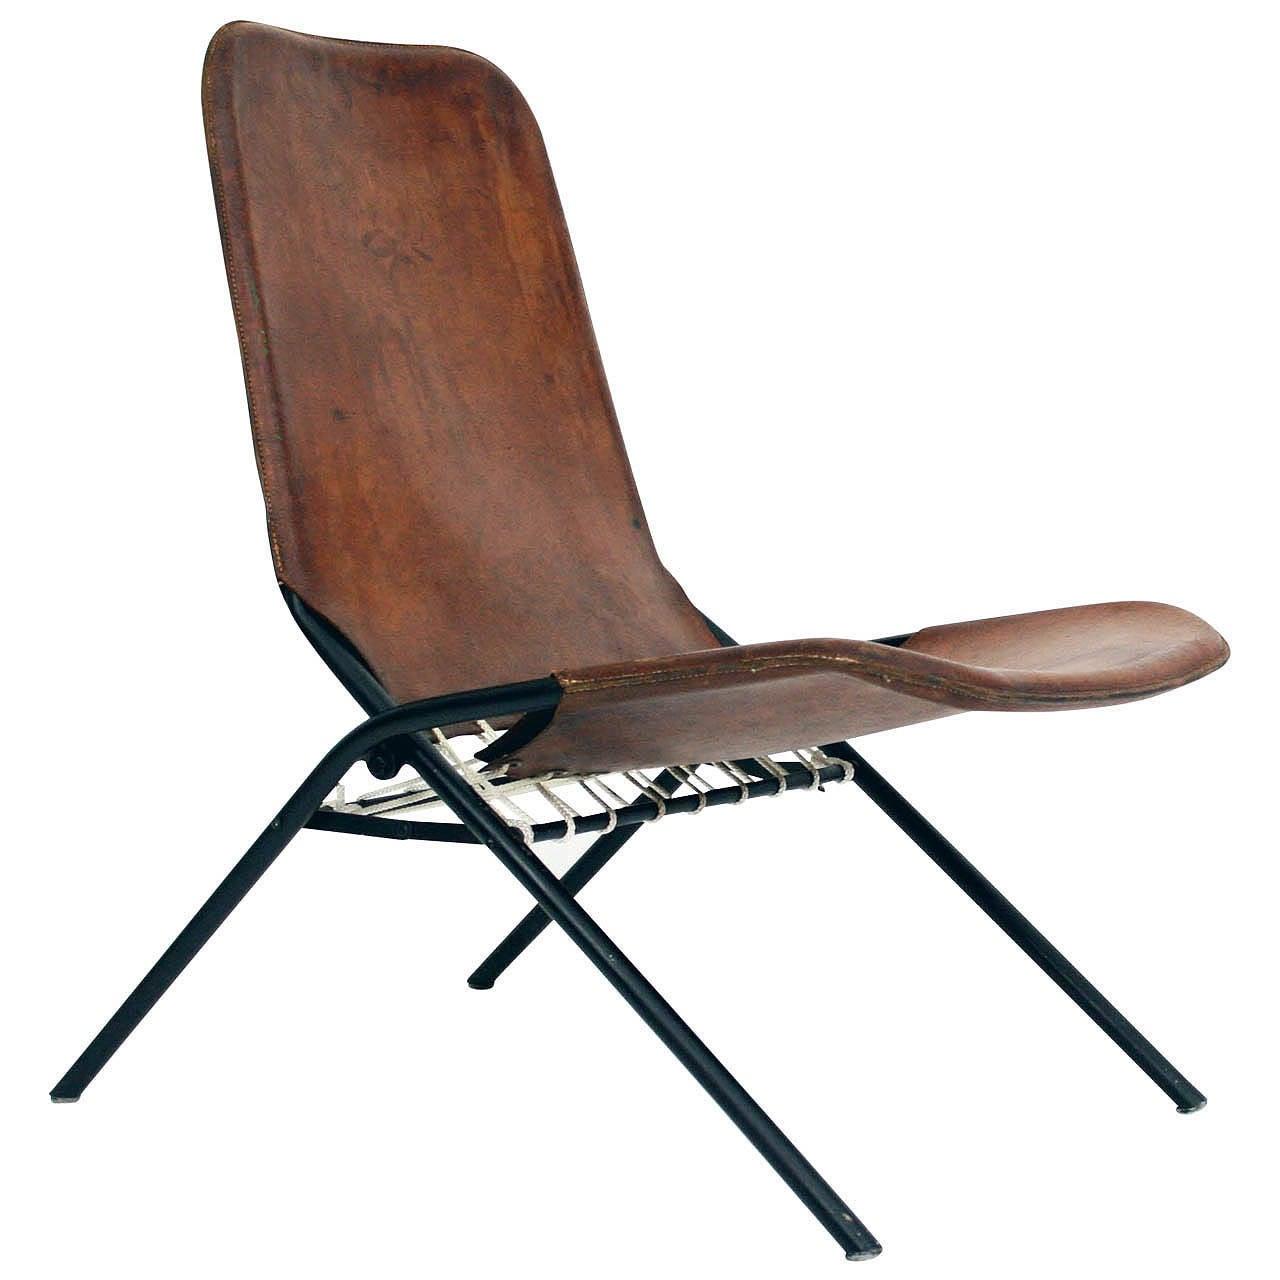 Rare 1950s Olof Pira Fällstol Folding Leather Lounge Chair